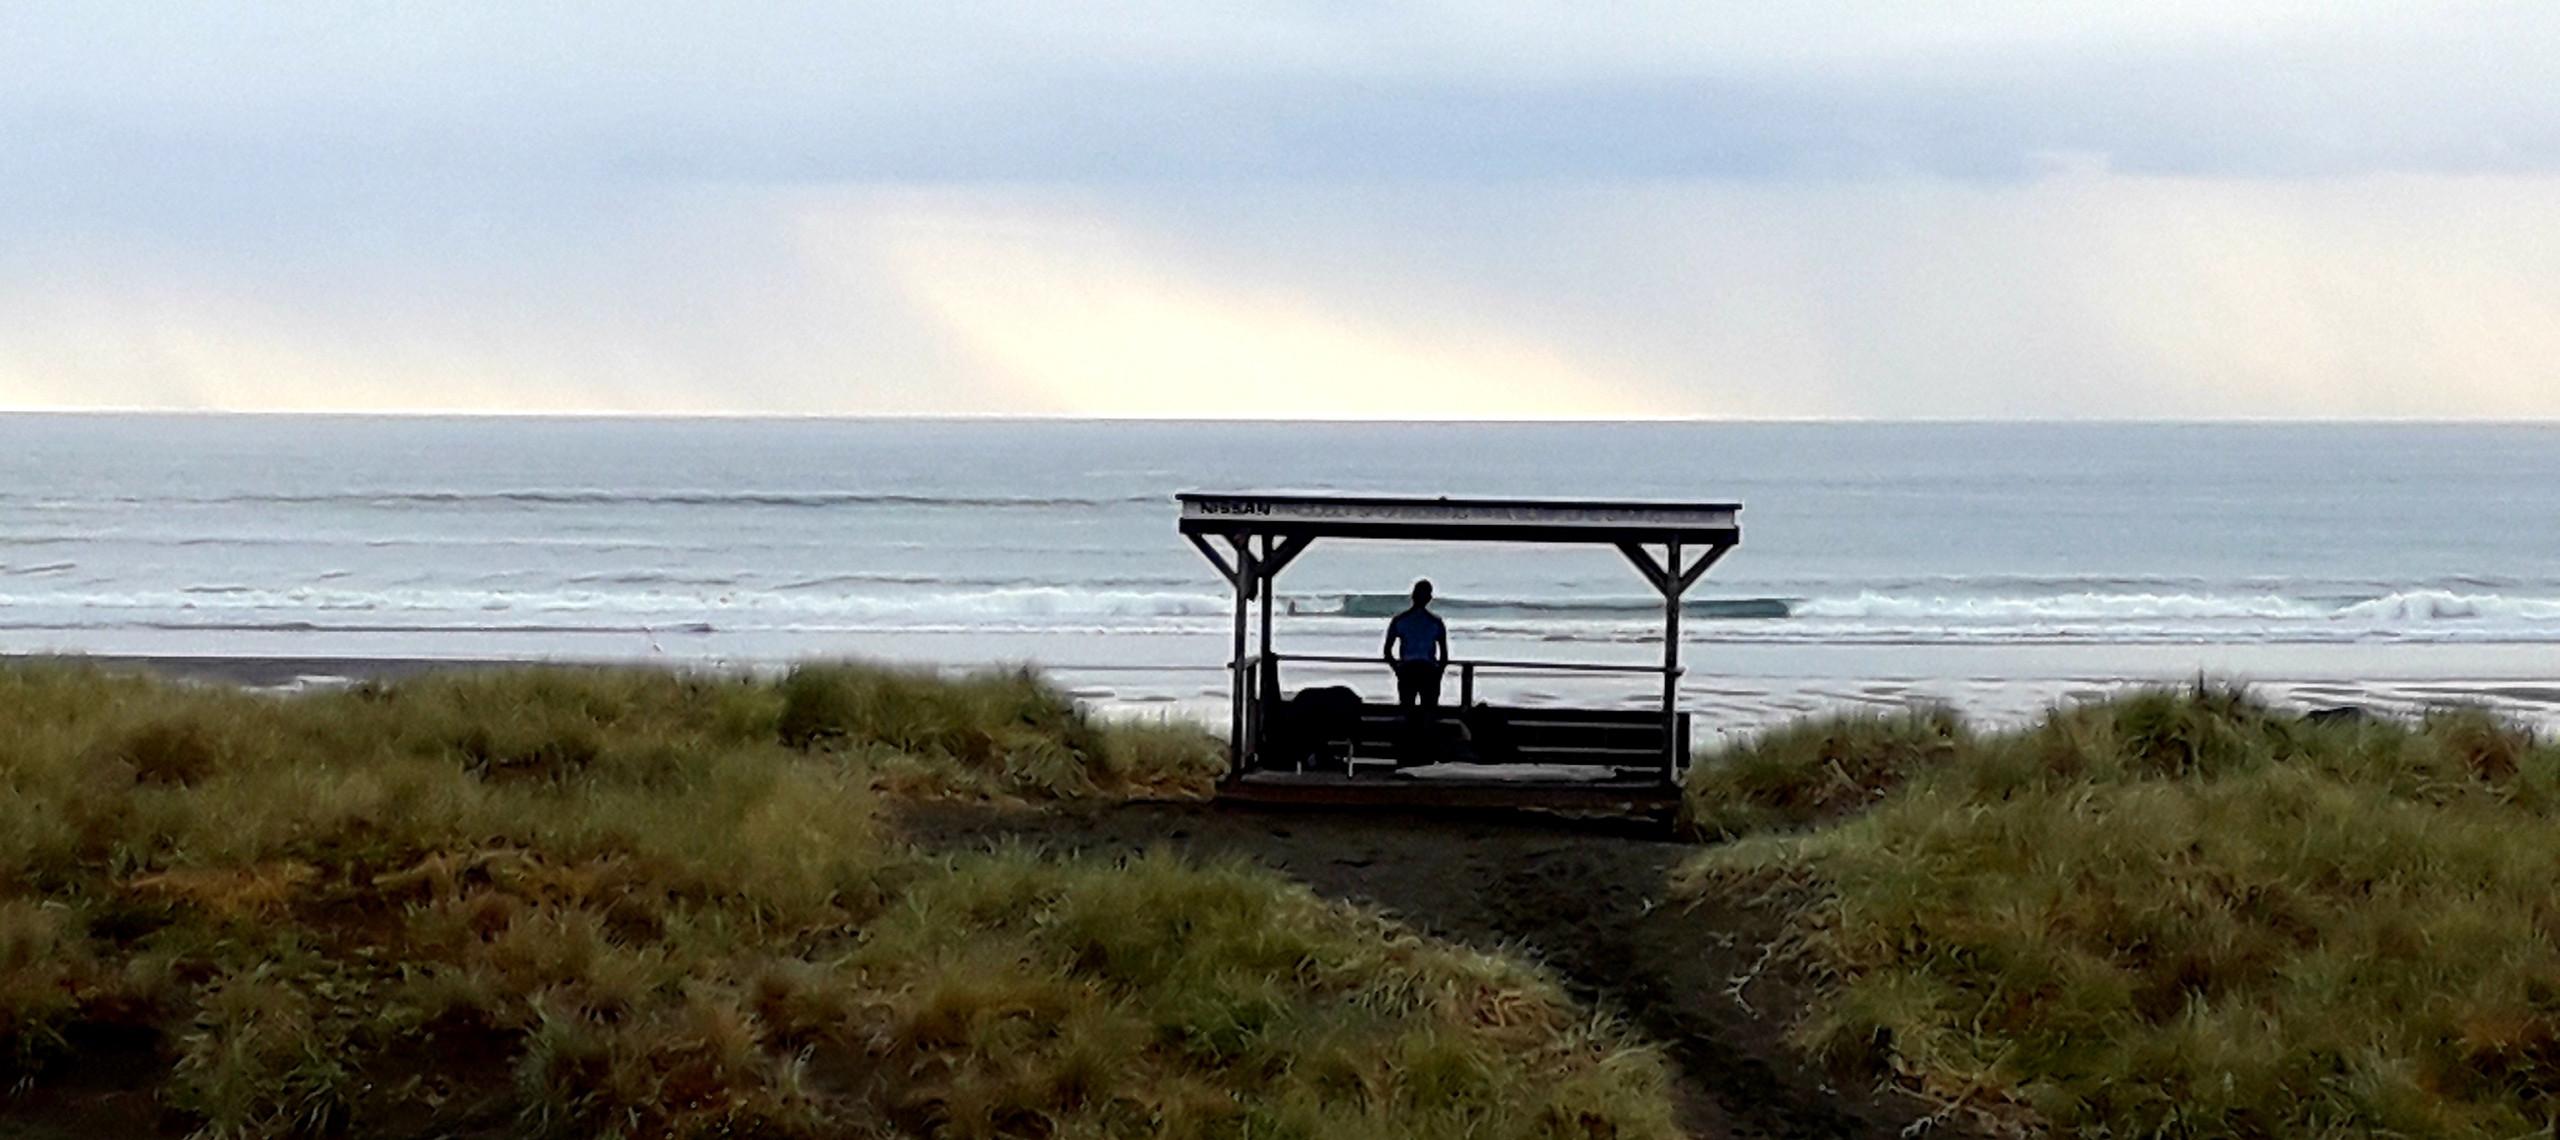 Staring at the sea. ©Taina CALISSI